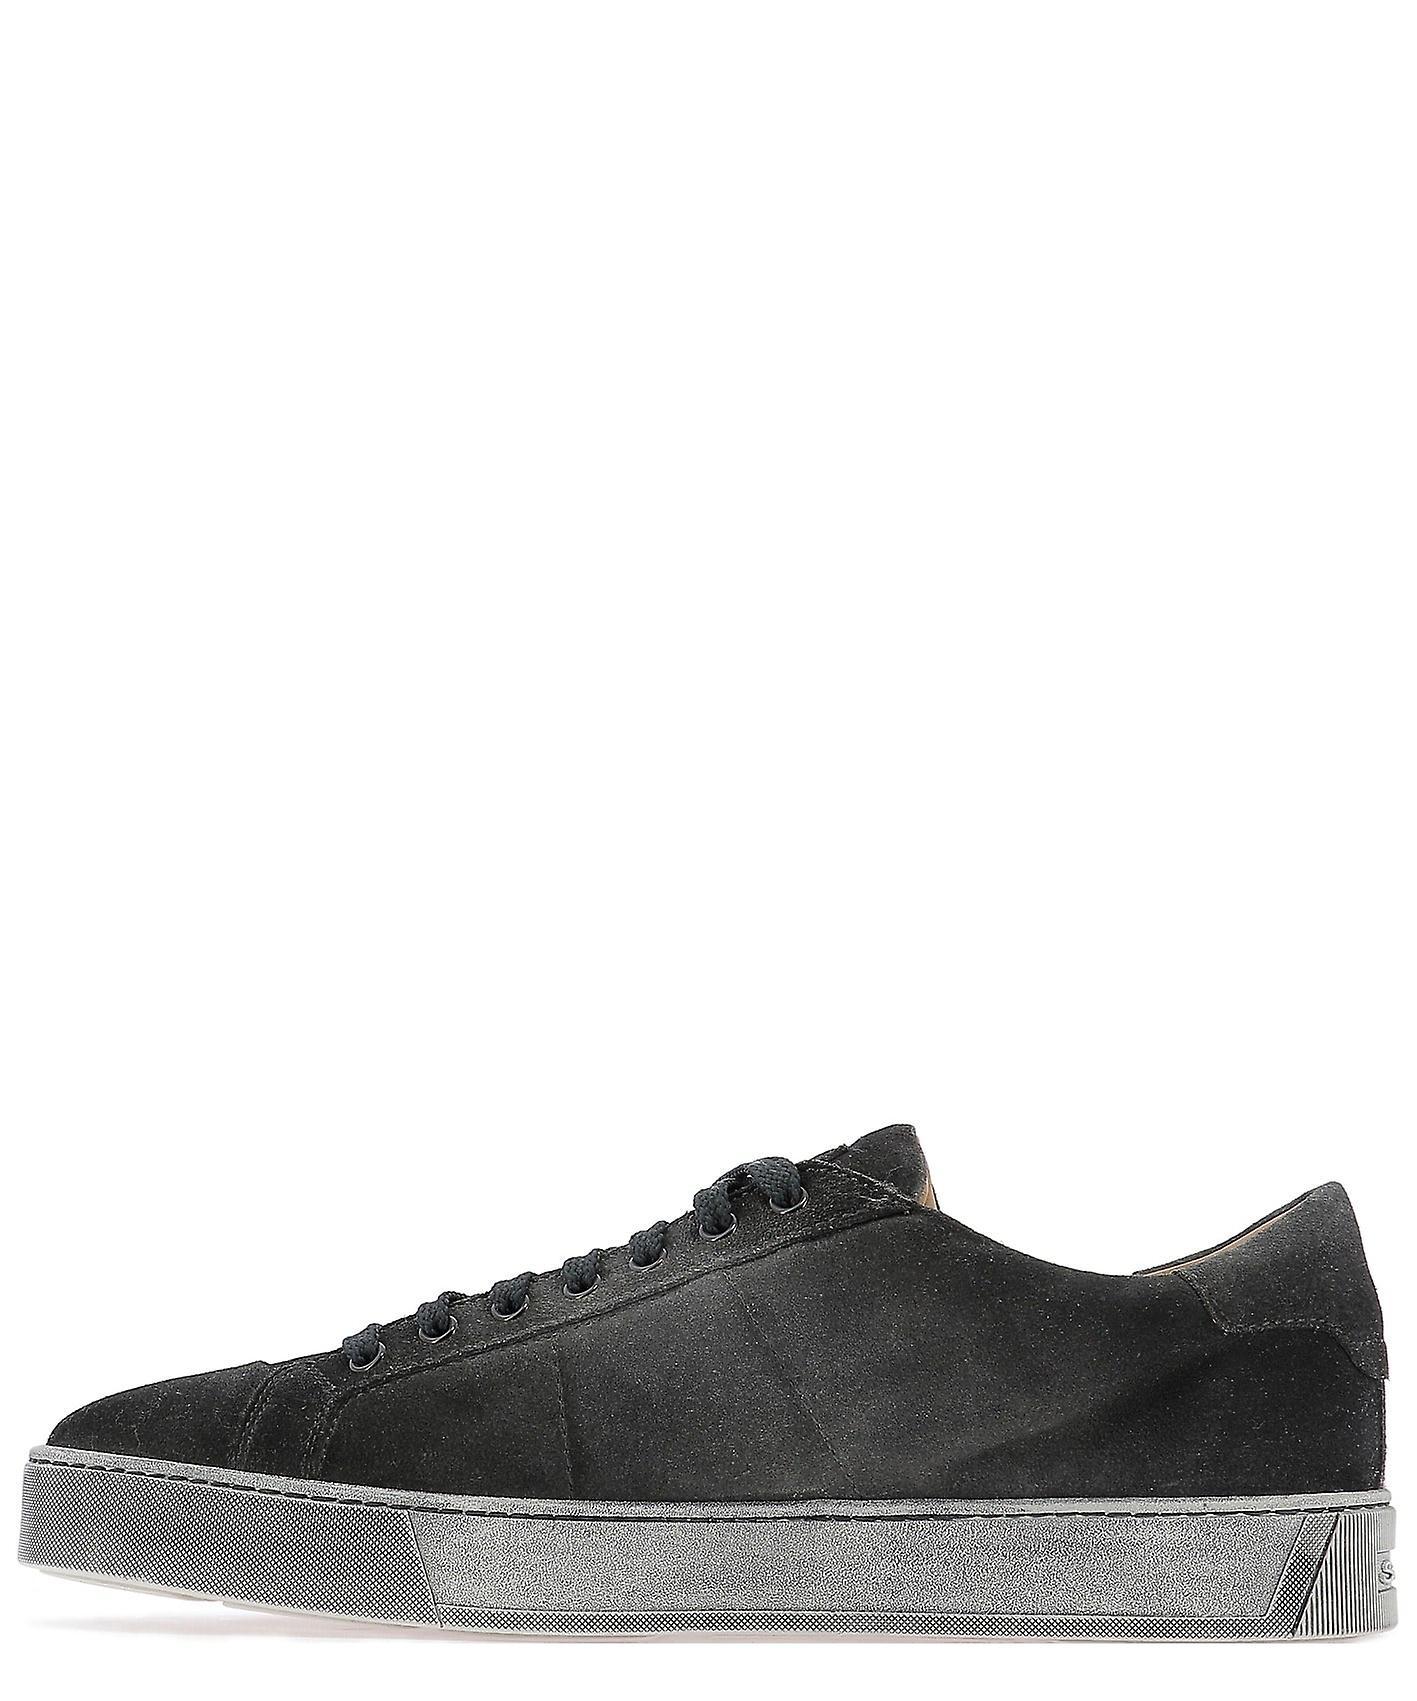 Baskets Santoni Mbgl20850sp0mpshg60 Hommes-apos;s Grey Suede Sneakers